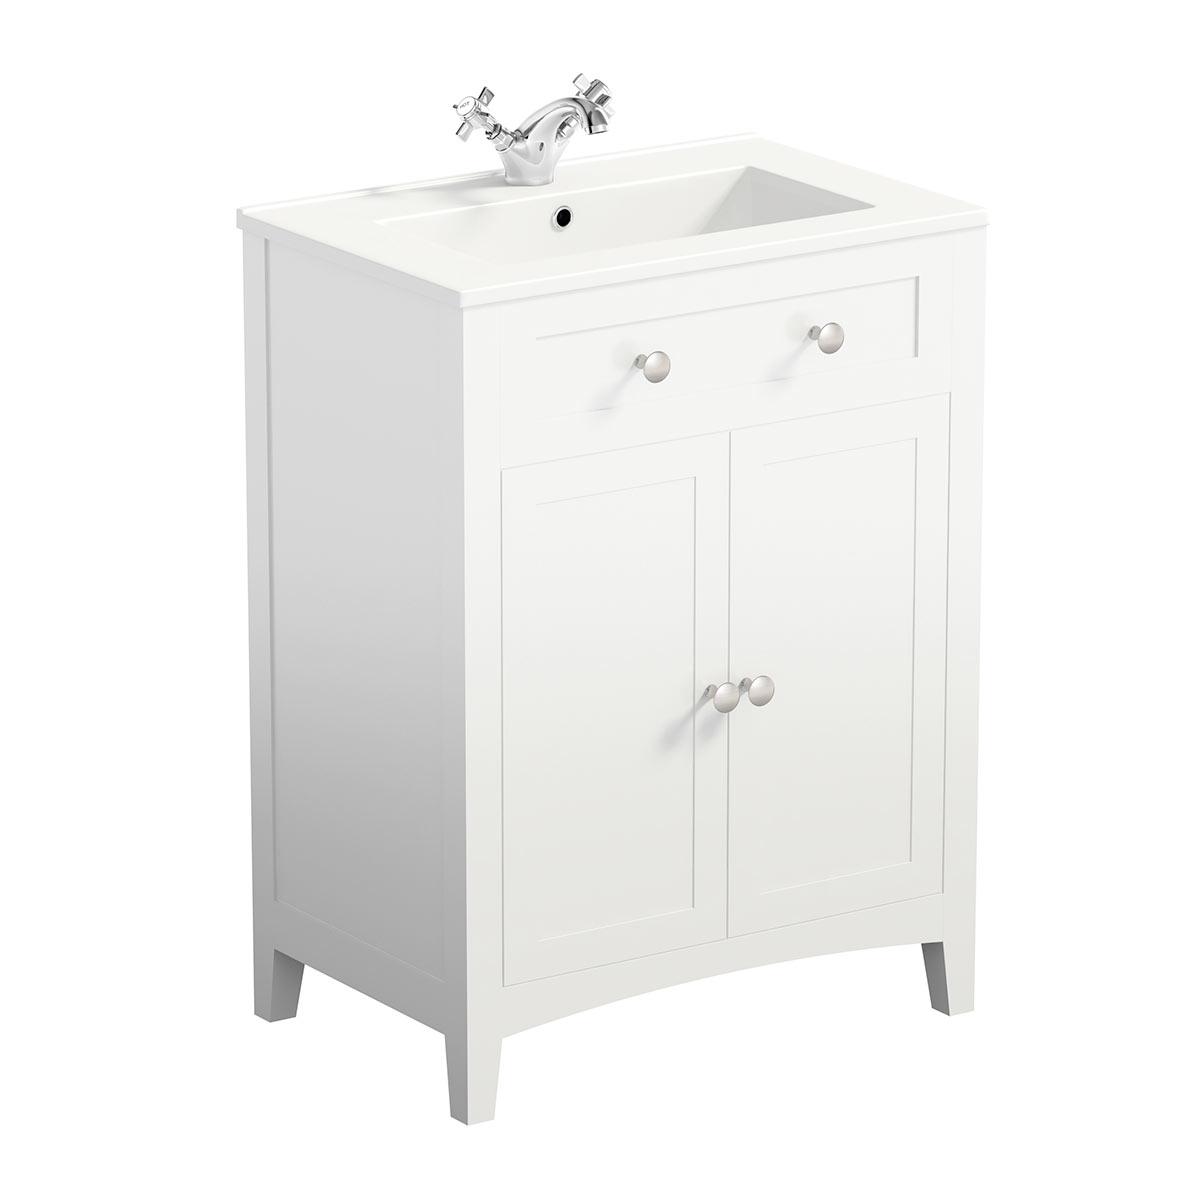 Bathroom furniture uk storage cabinets for Bathroom cabinets victoria plumb